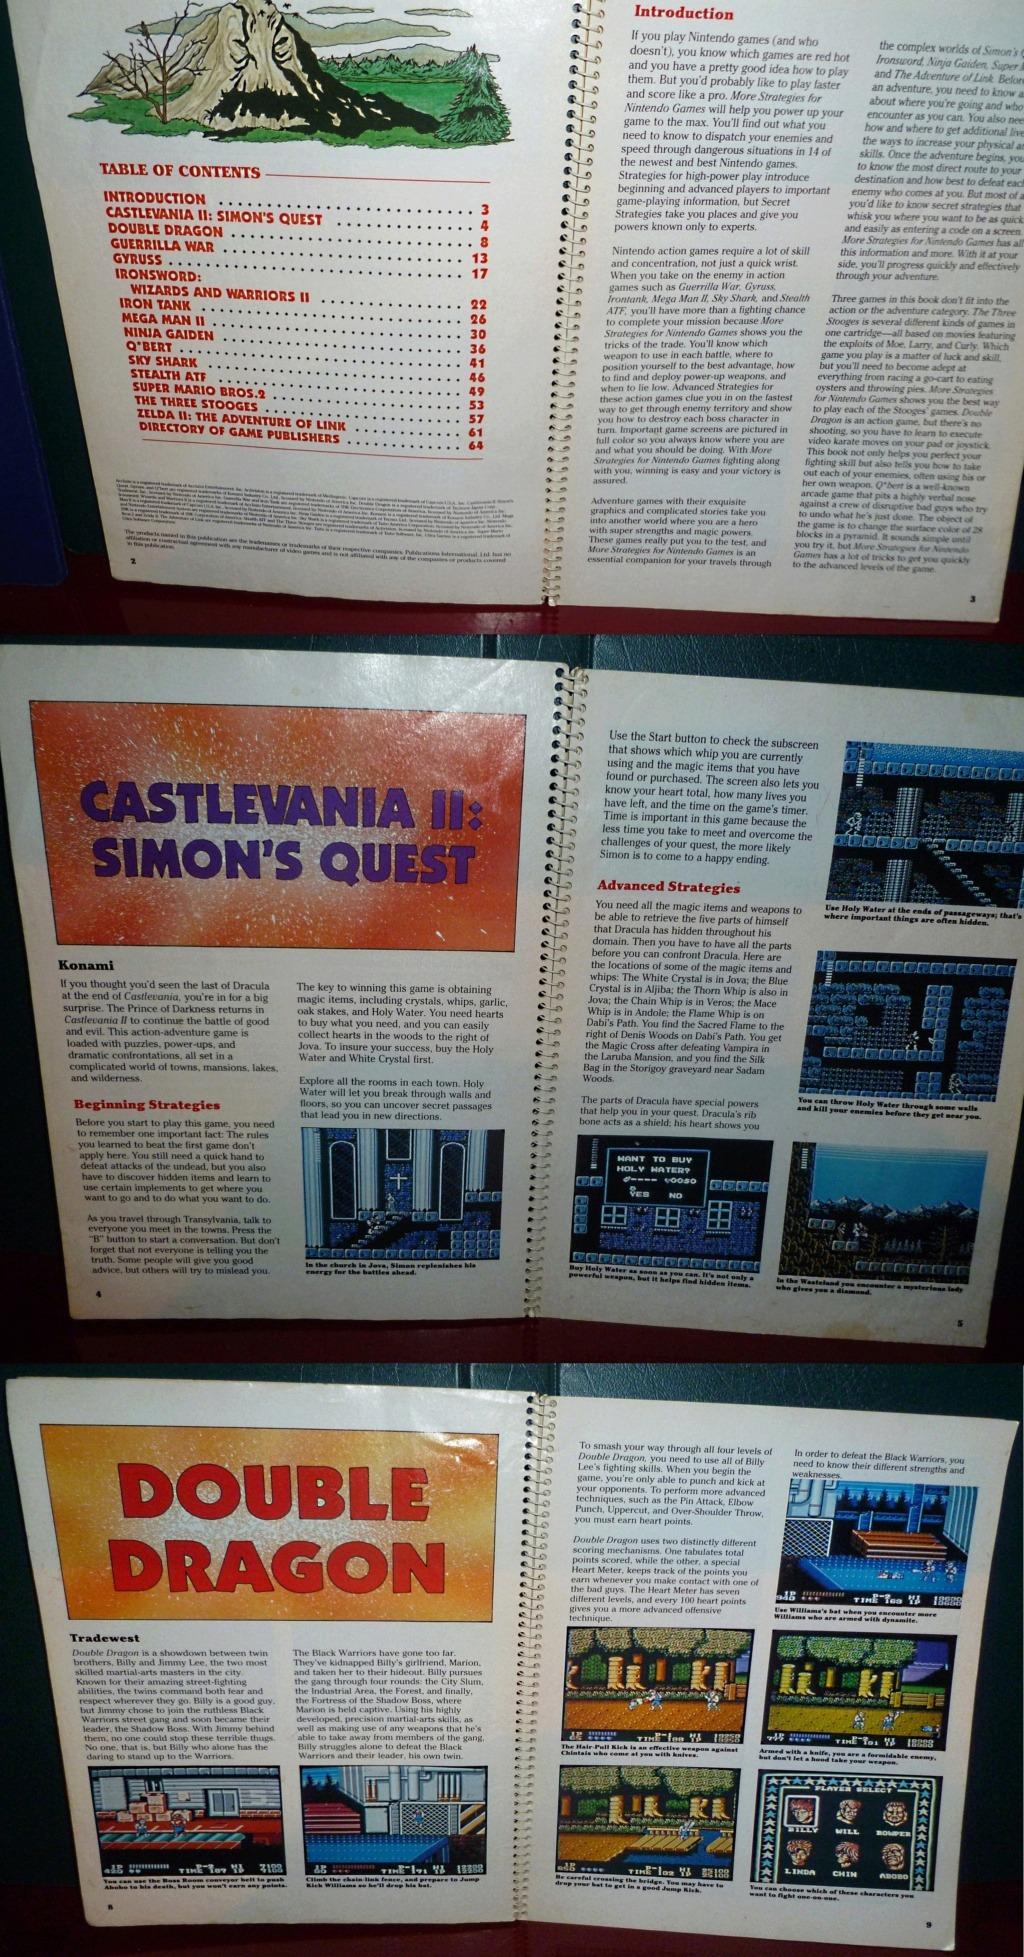 My Video Game Figures & Strategy Guides: Super Godzilla & Predator Games! Book_110